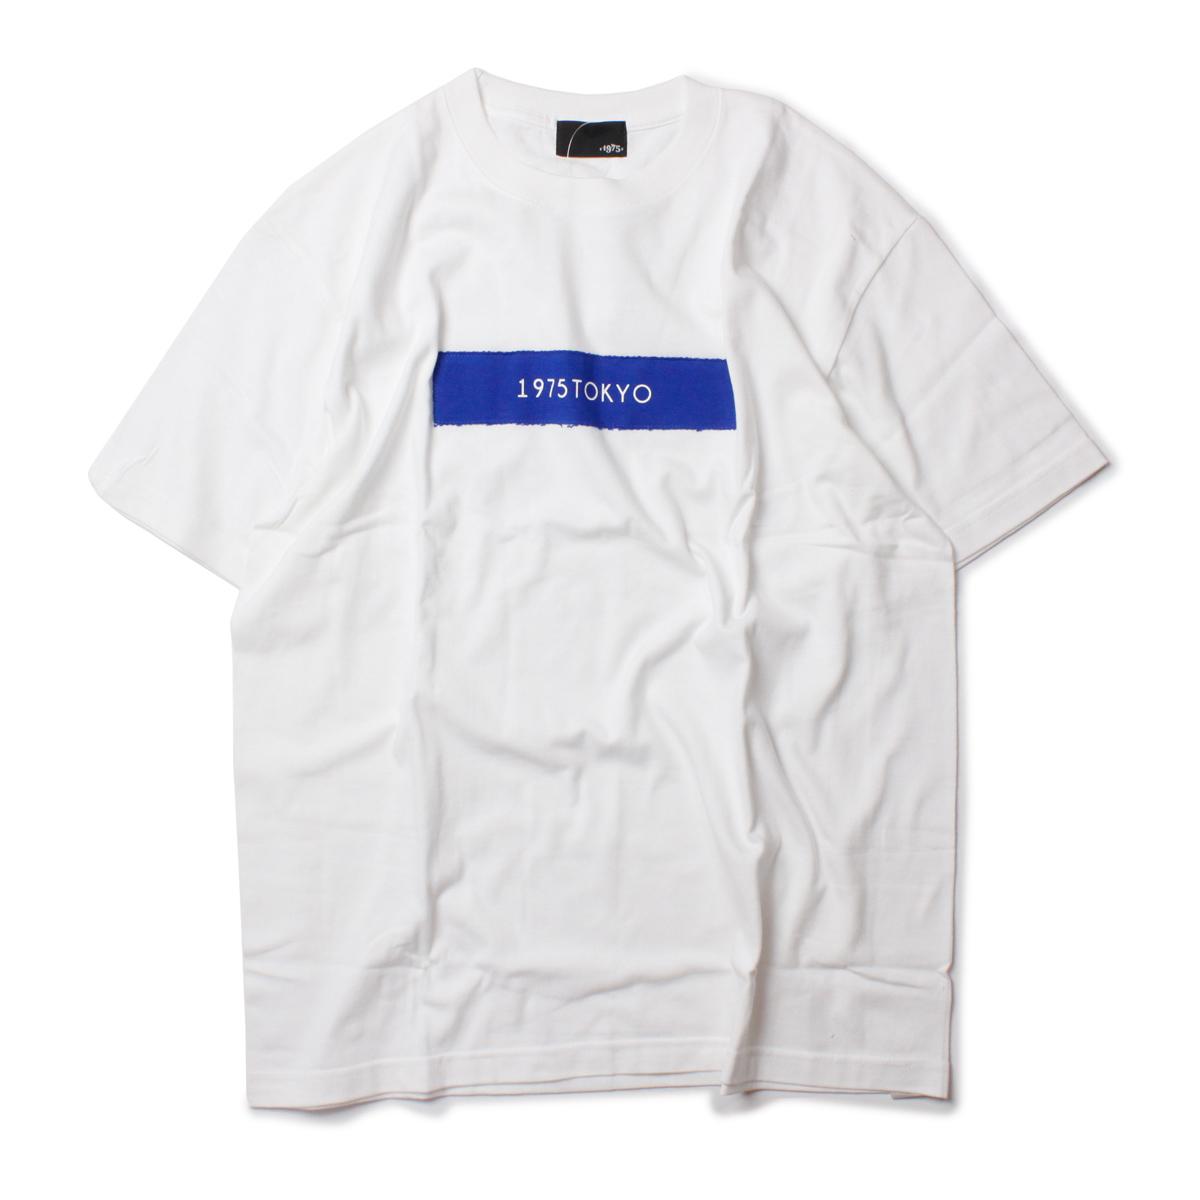 1975 TOKYO 1975トーキョー ボックスロゴTシャツ